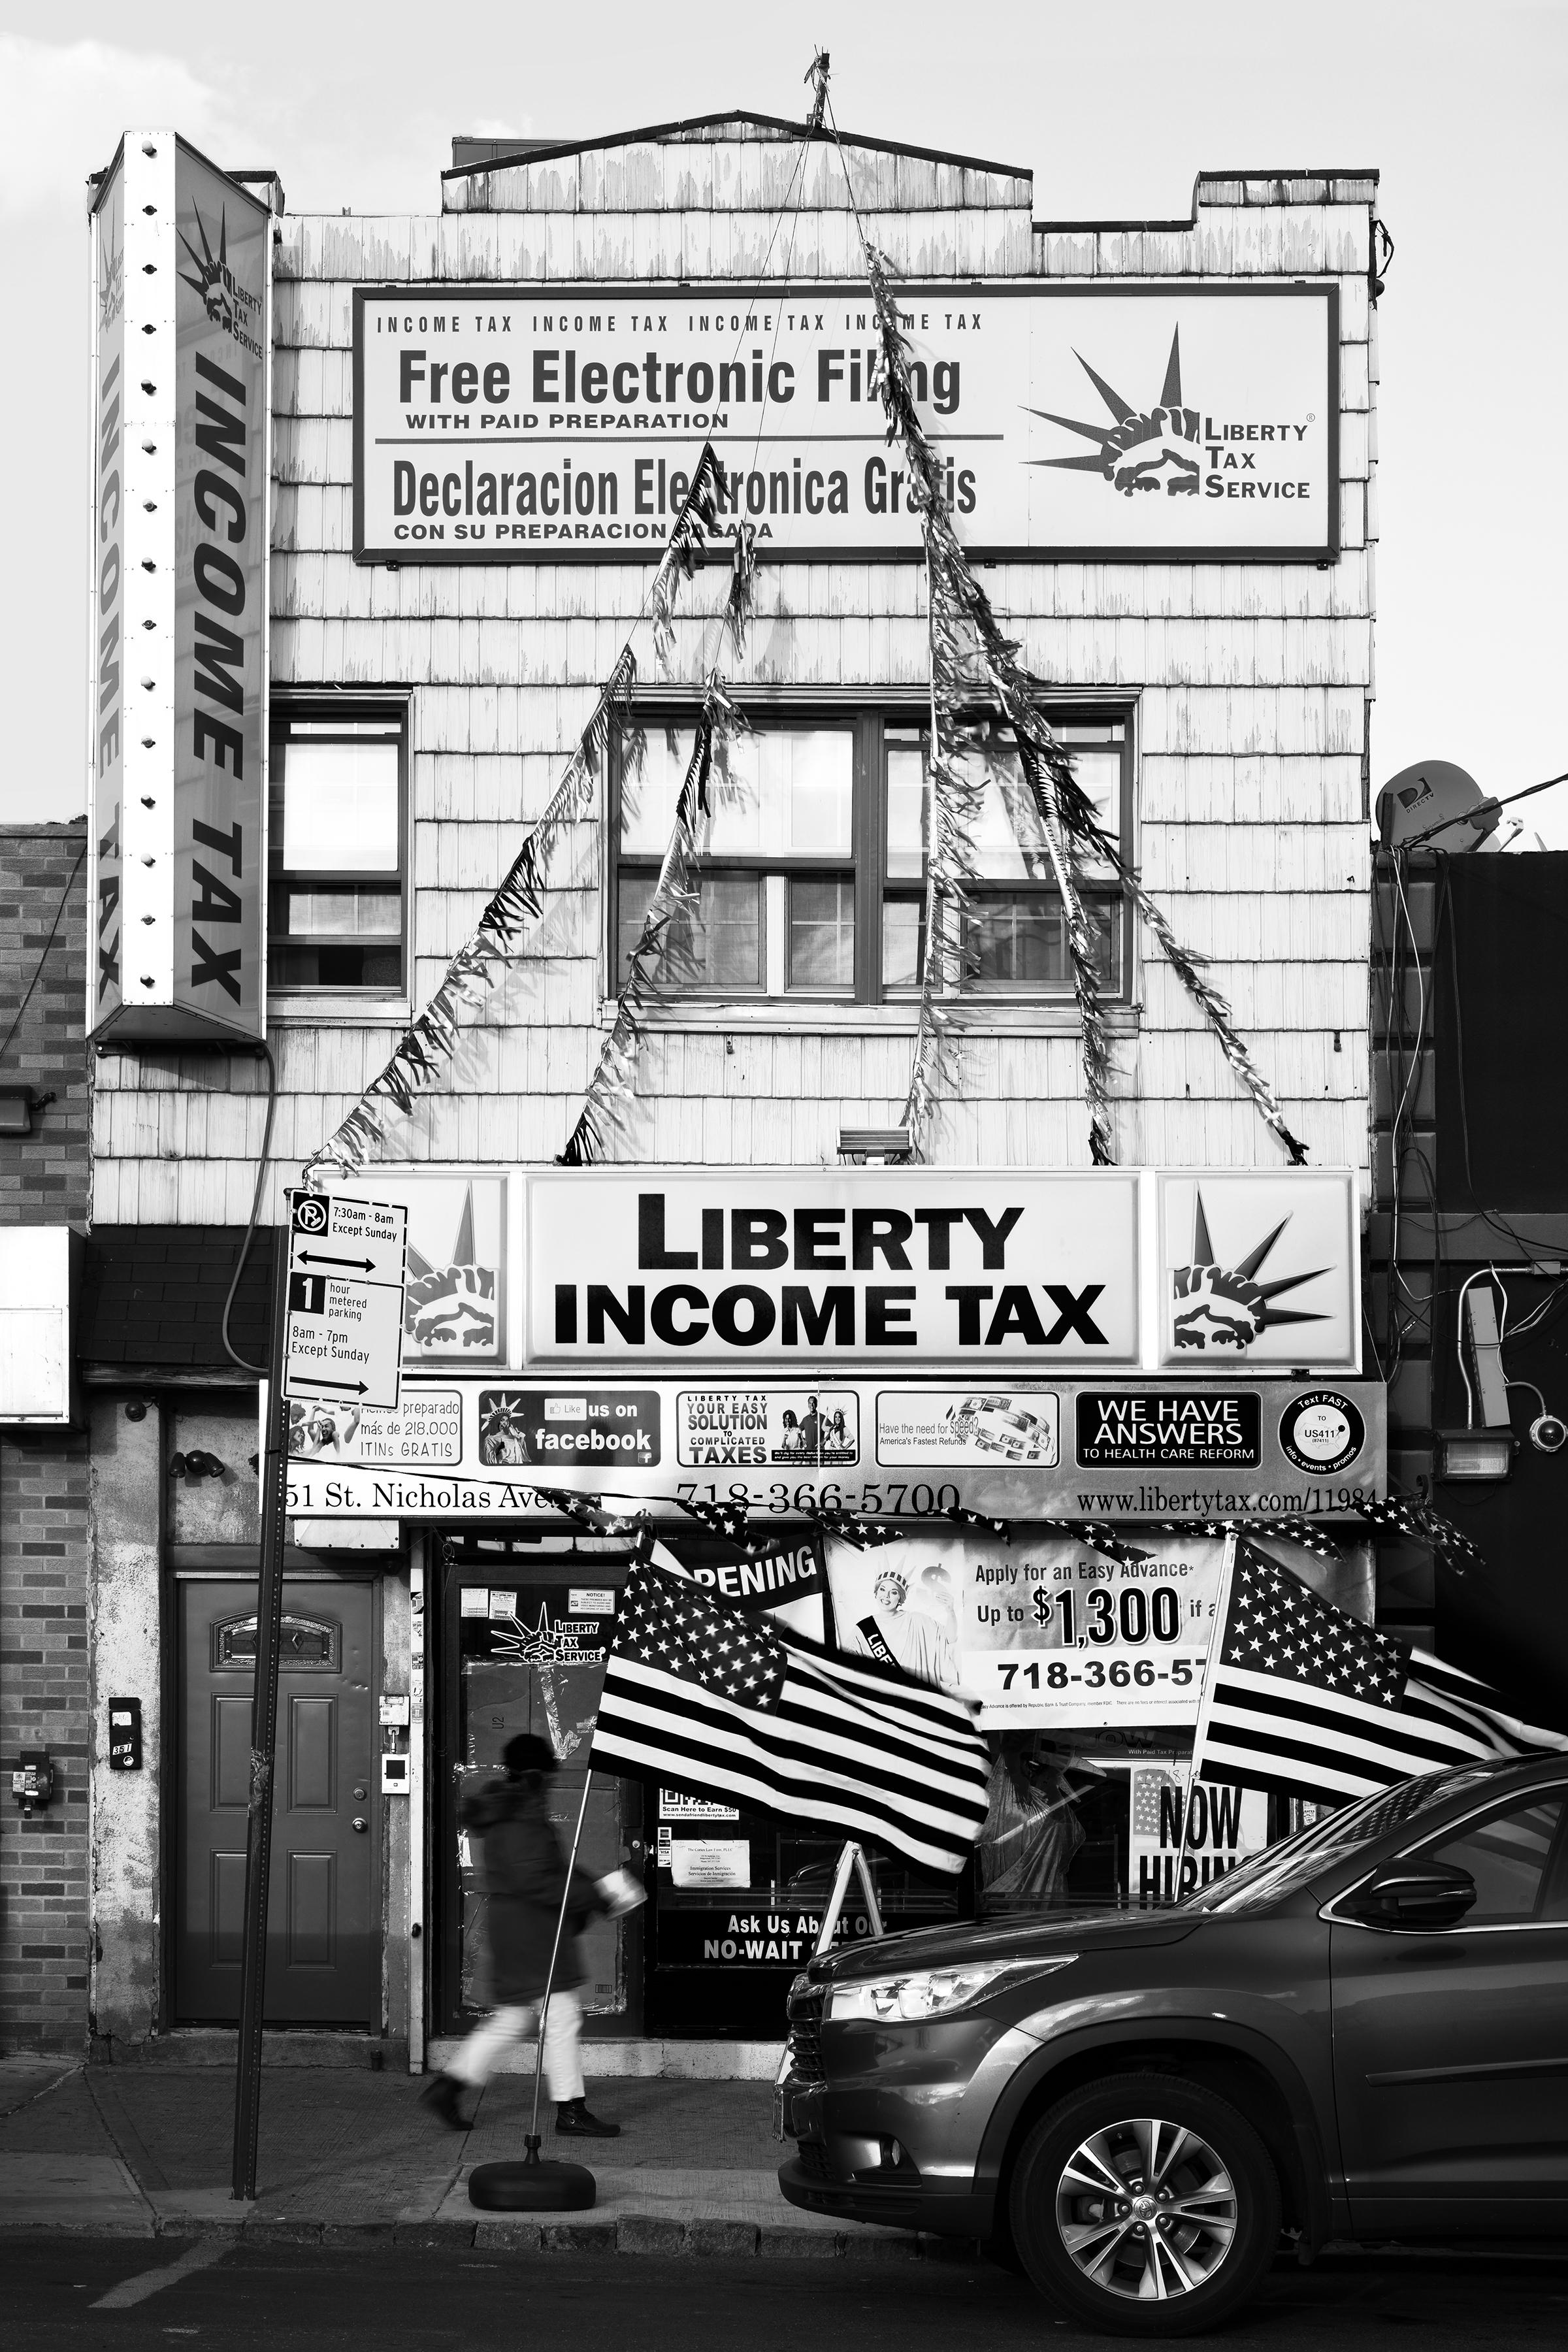 LibertyTax3170-2merged.jpg